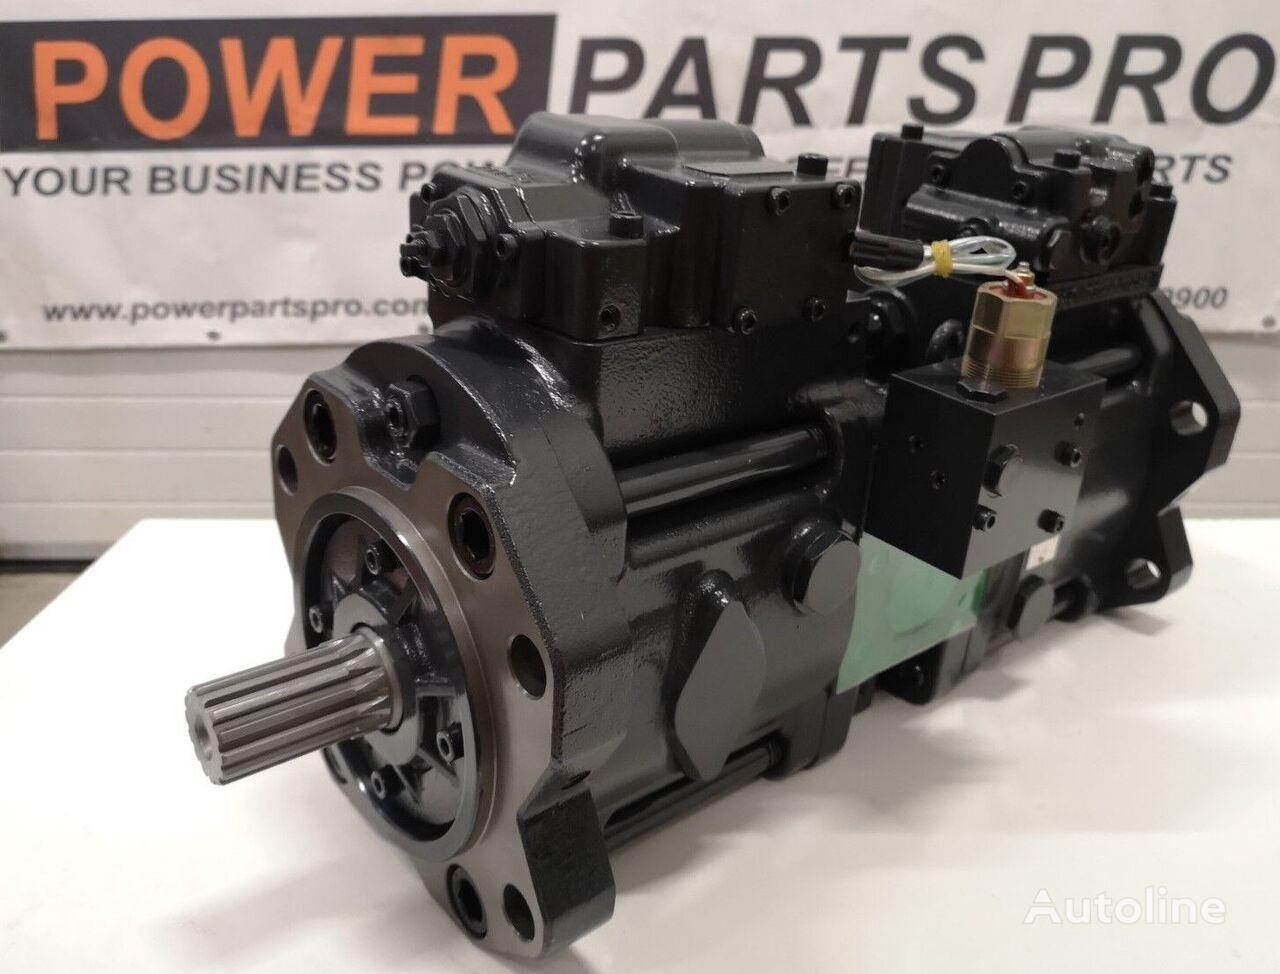 new K3V112DT-1GMR-9C79+F (215/11278) hydraulic pump for JCB JS220 excavator